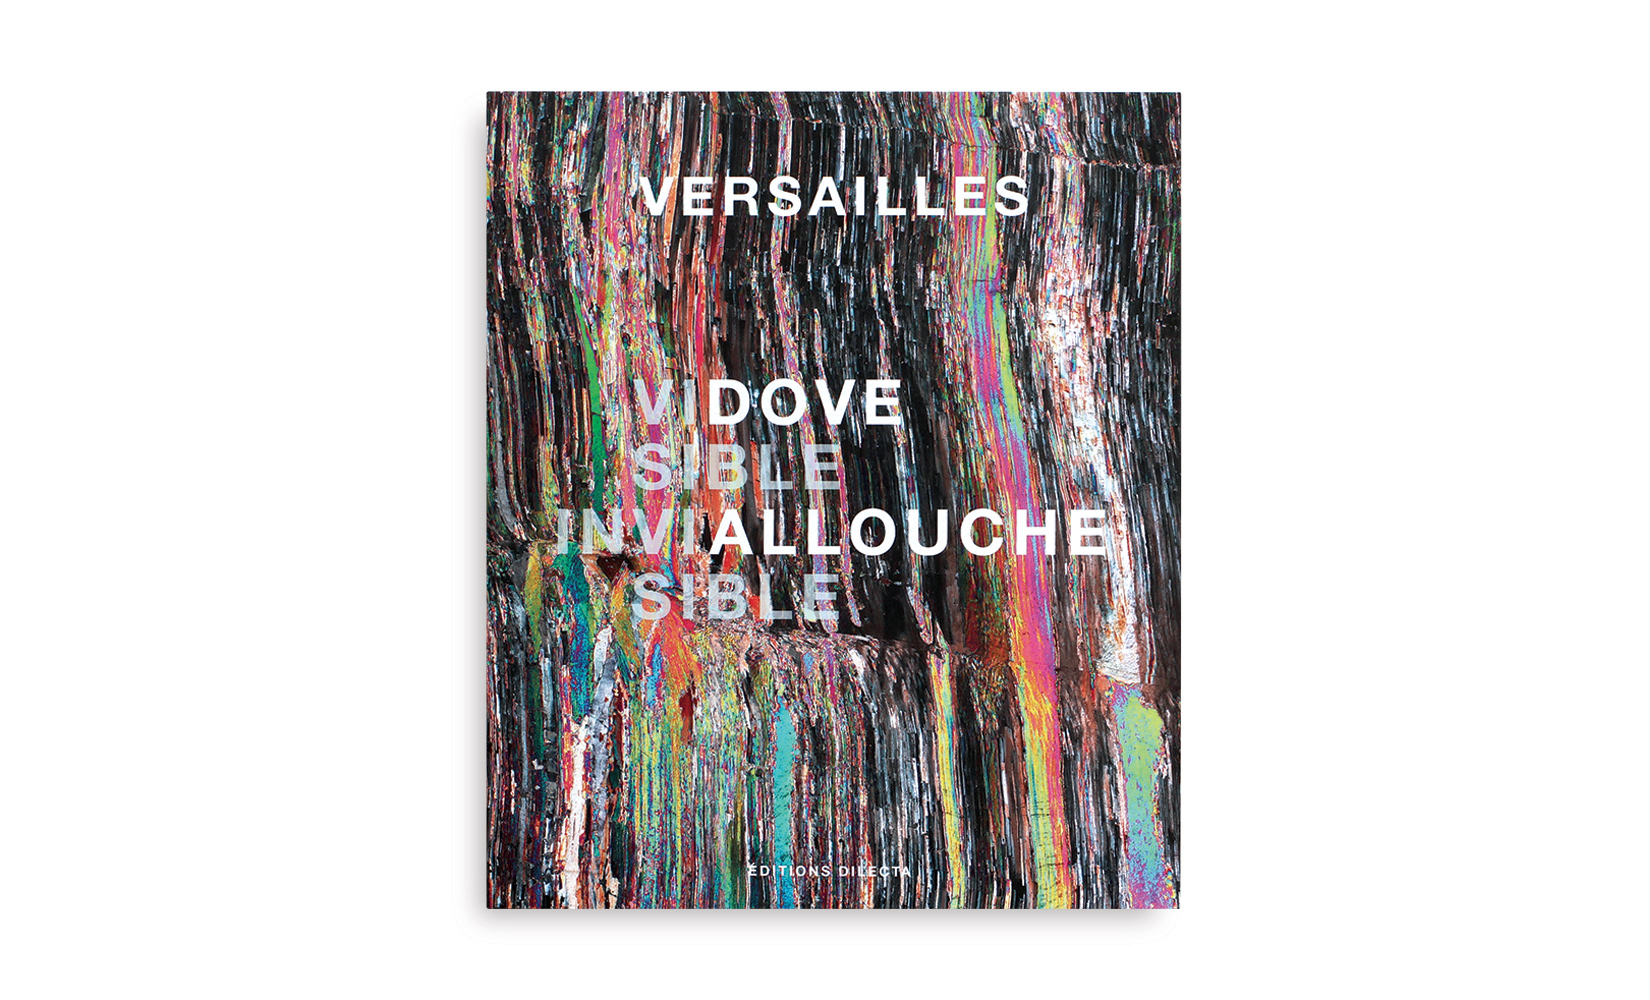 versailles-visible-invisible-toluca-studio-olivier-andreotti-ALLOUCHE-1.jpg